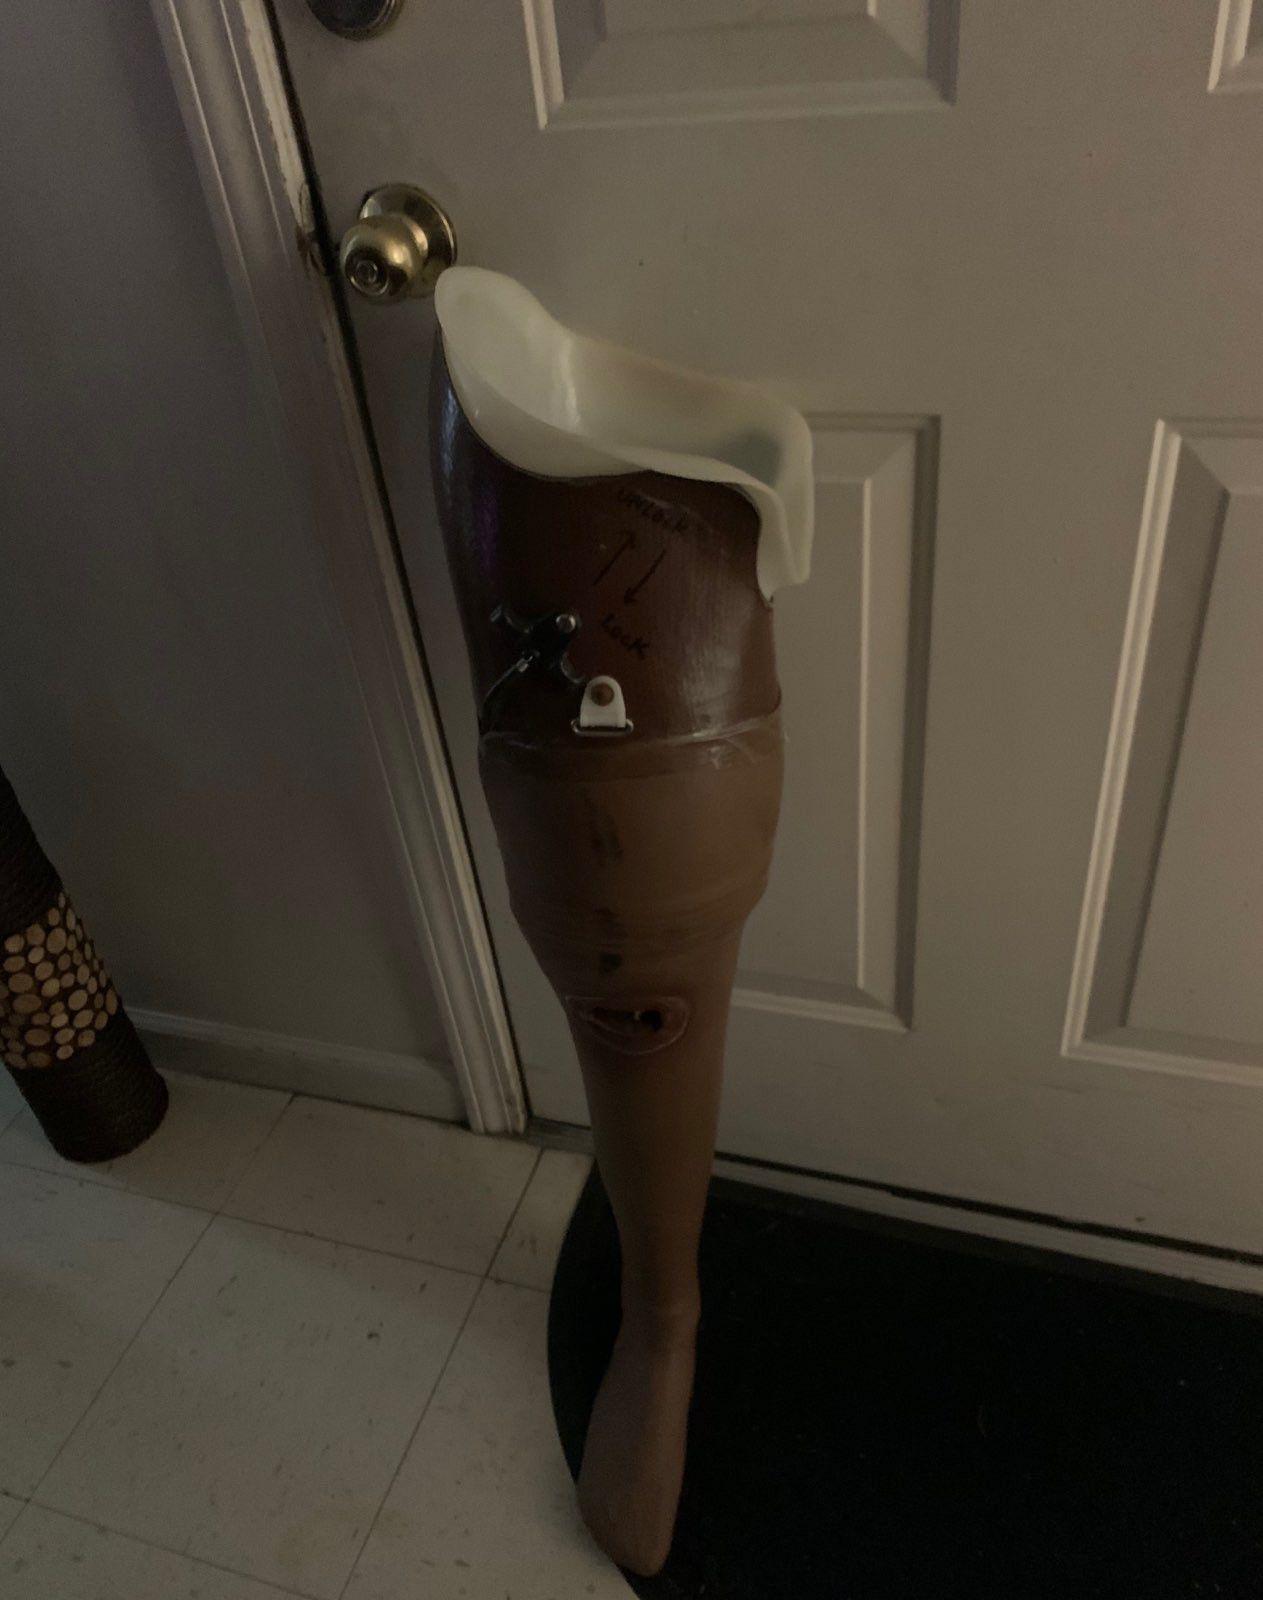 Prosthetic right leg